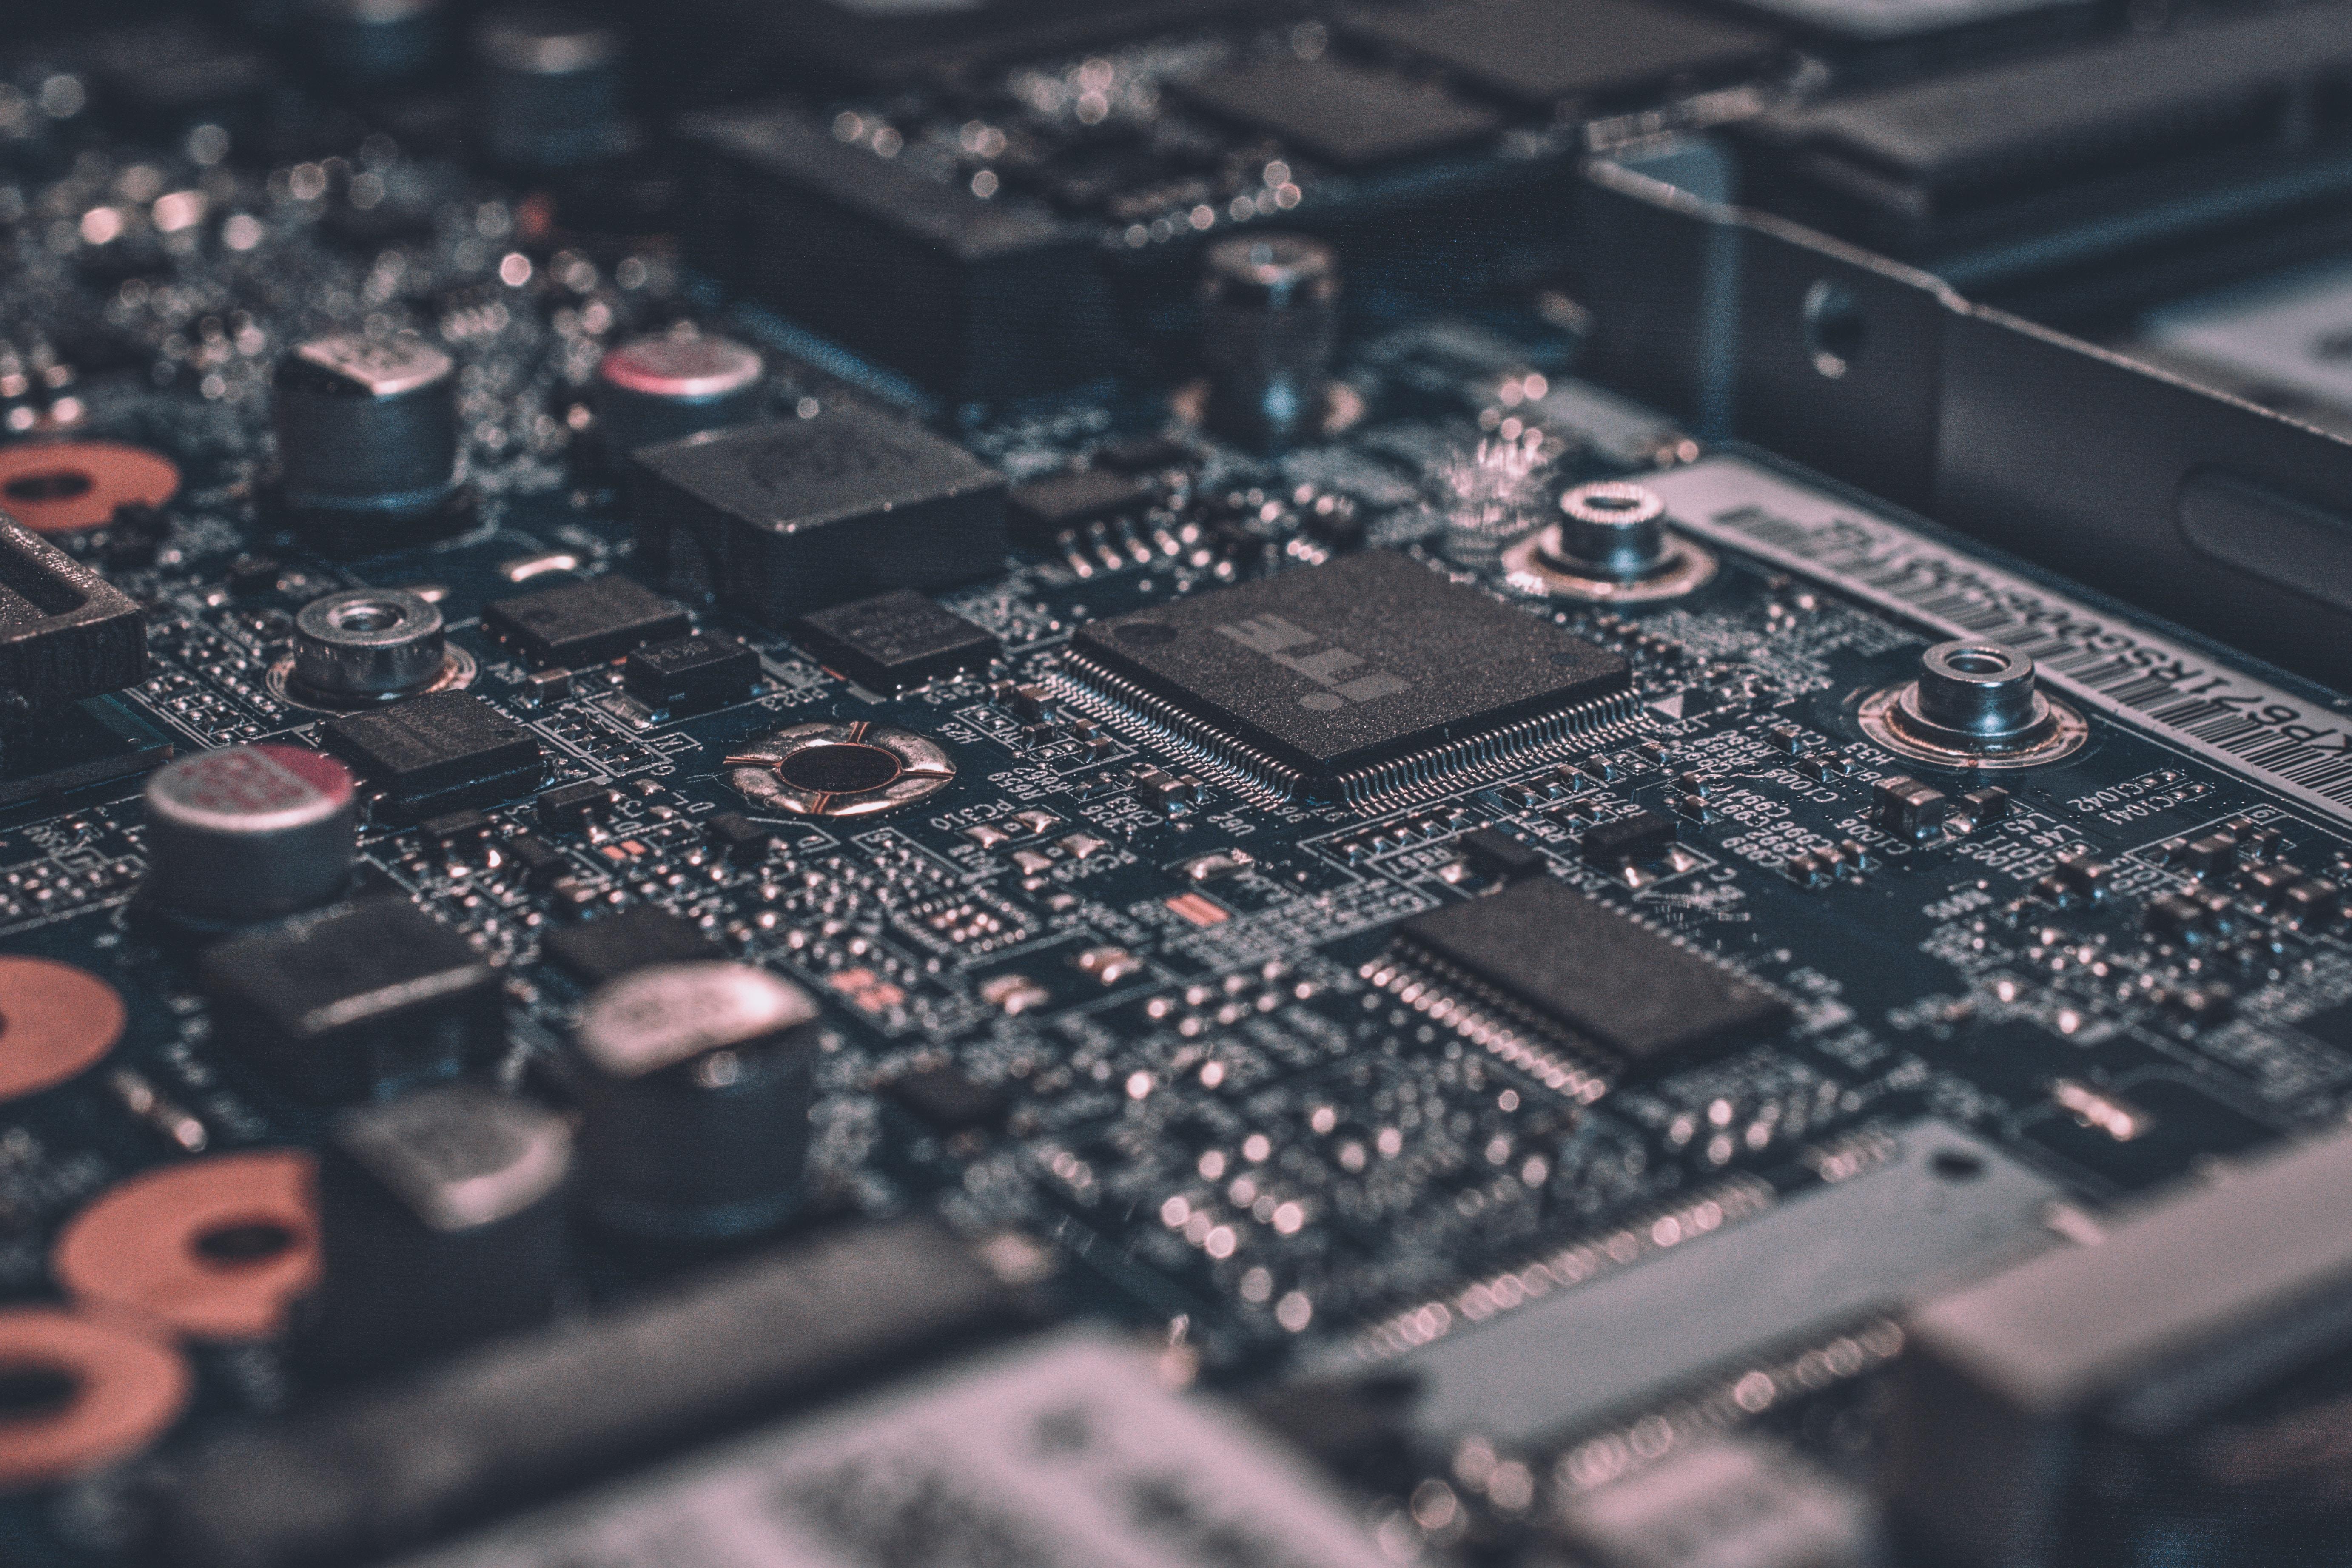 Internet of Things (IoT) Platforms Market - Major Technology Giants in Buzz Again | PTC (ThingWorx), Cisco (Jasper), Microsoft, Google - The Manomet Current